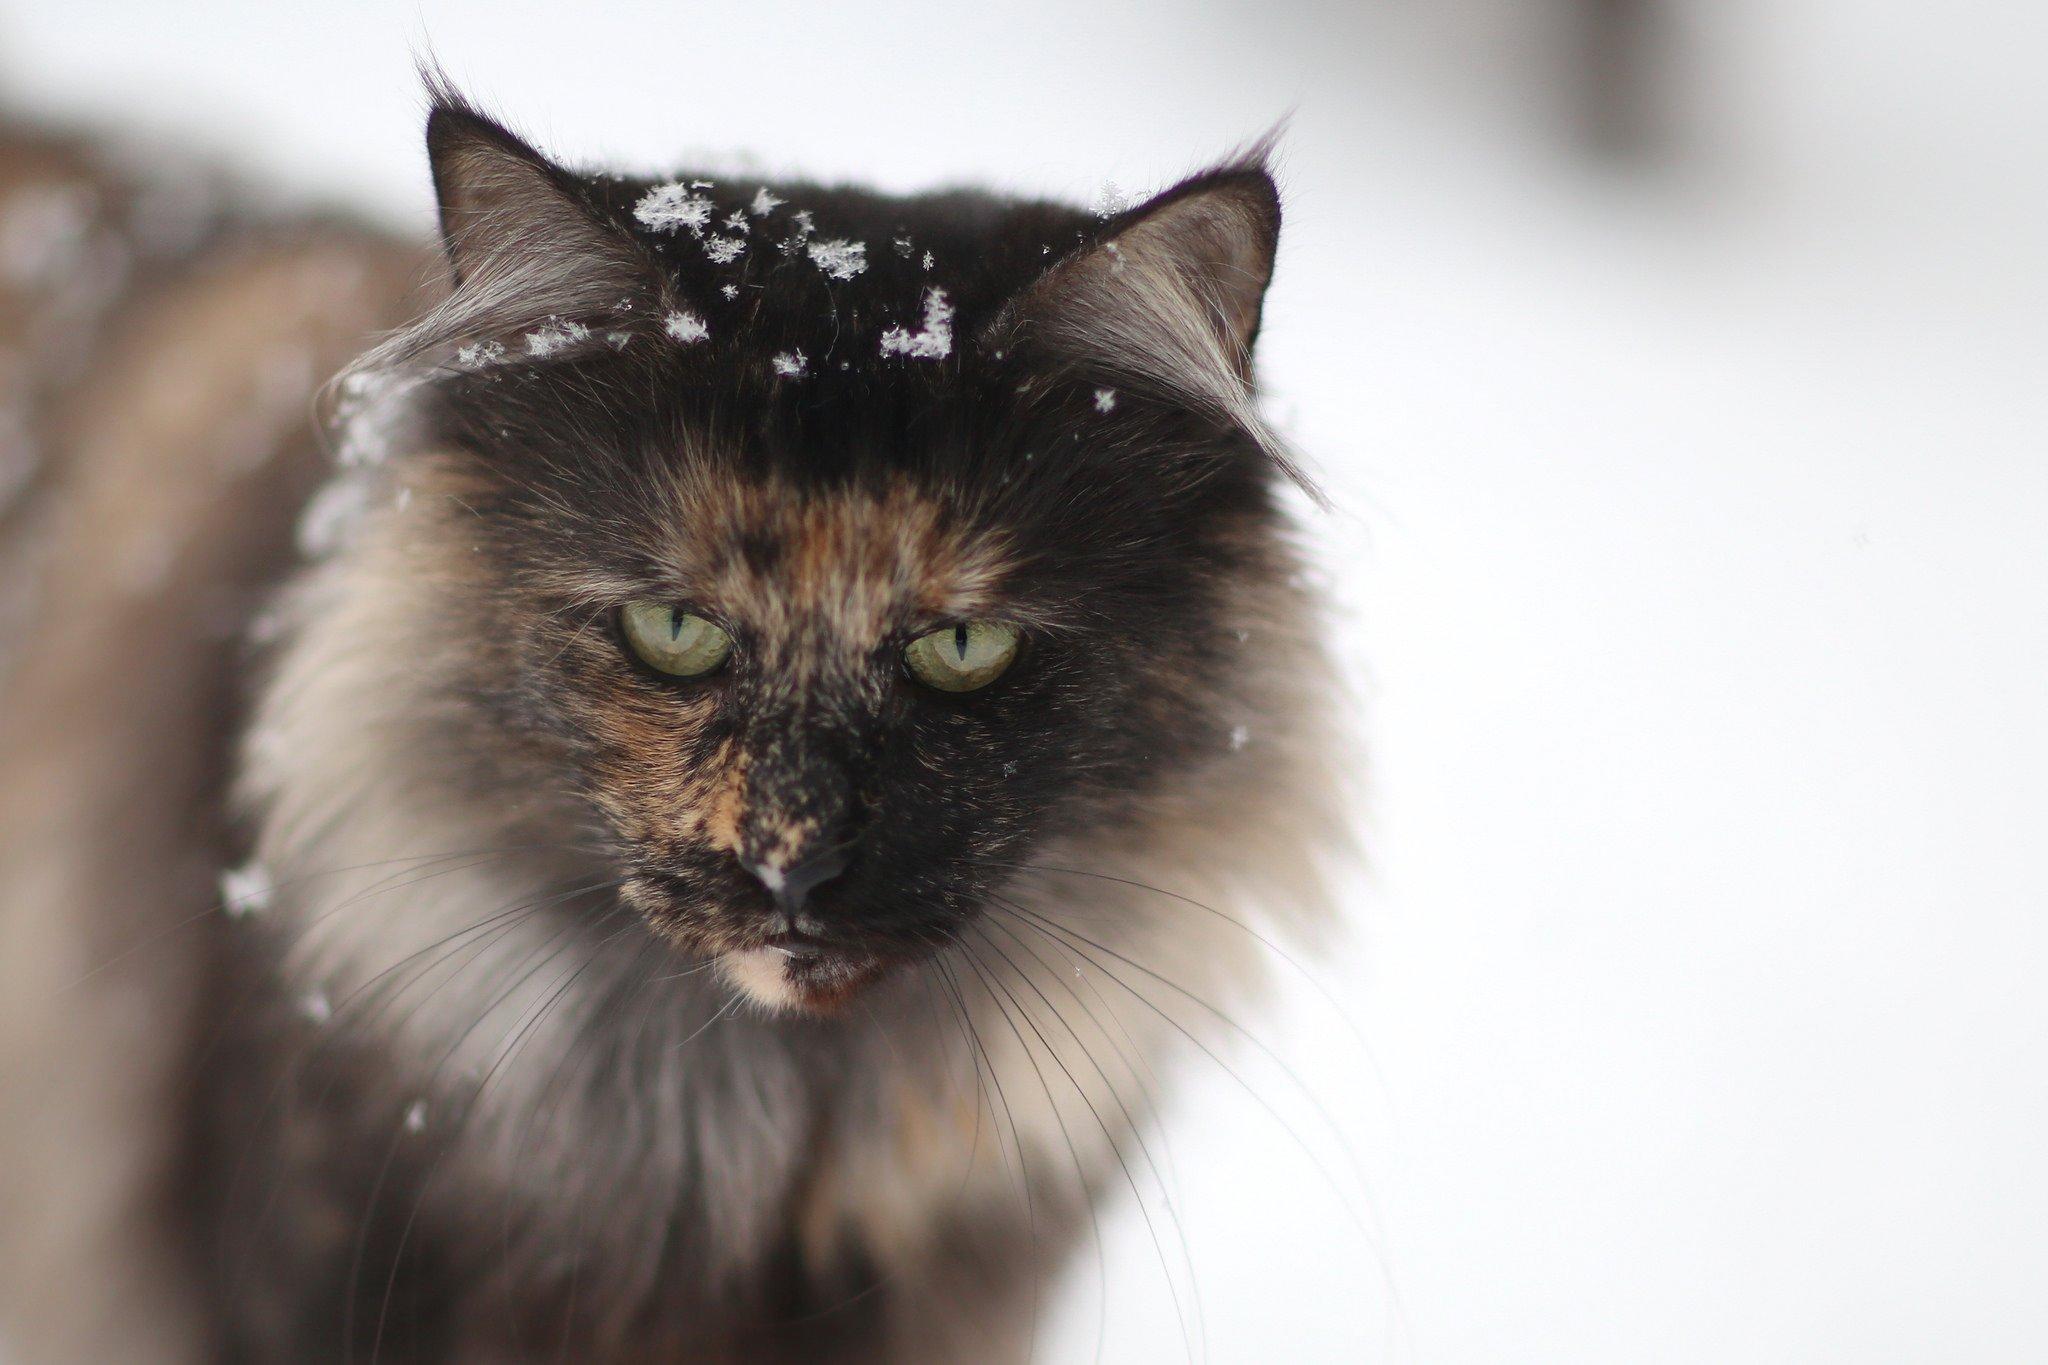 Black Metal Cats on Twitter: